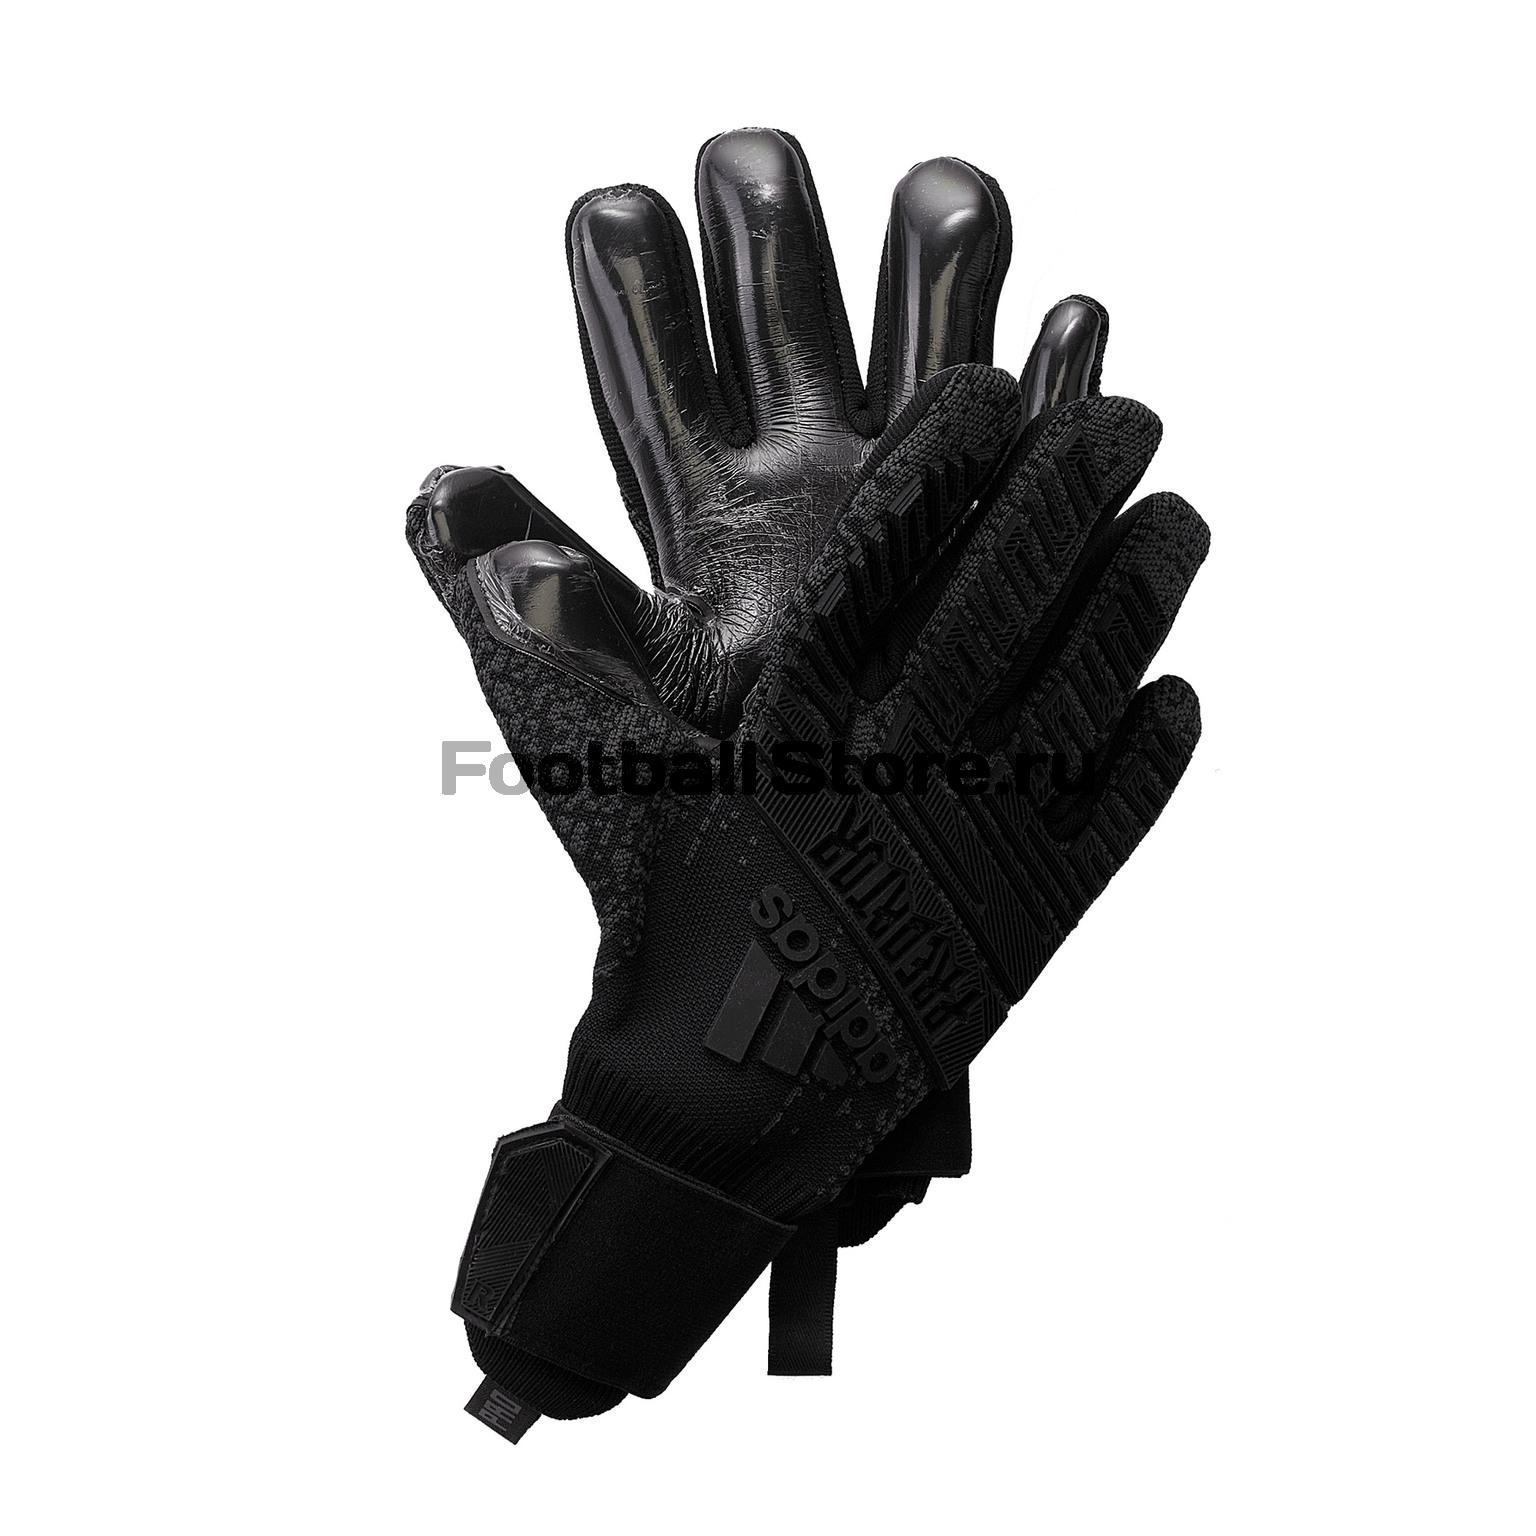 Перчатки вратарские Adidas Predator Pro DY2596